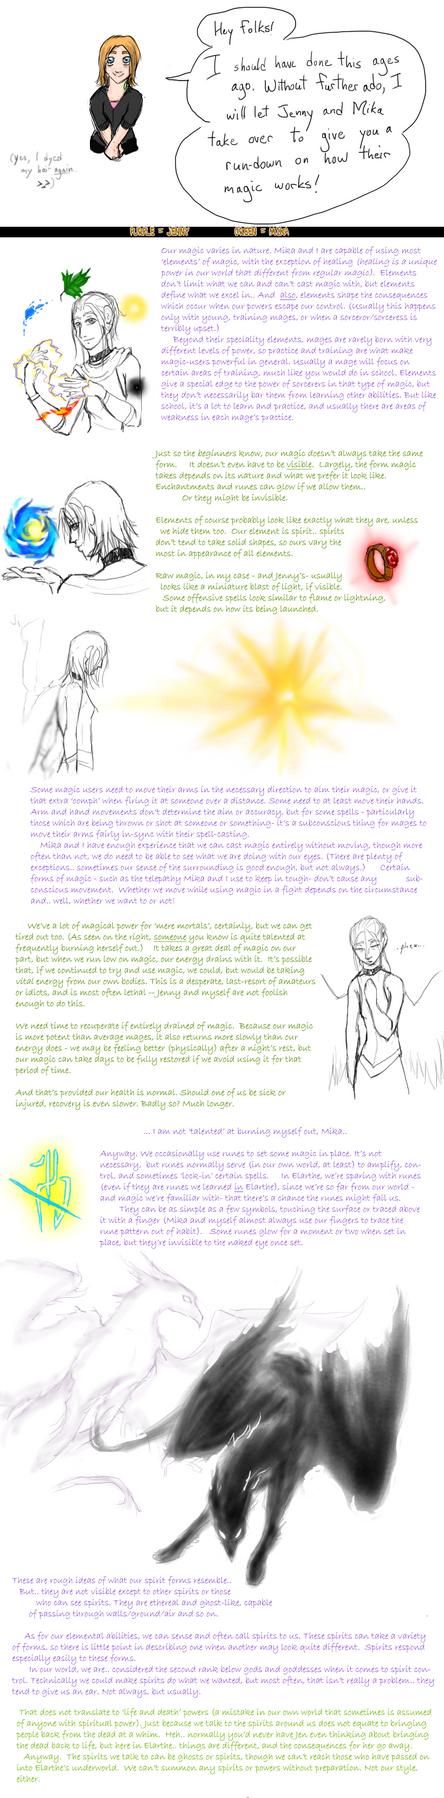 EA-LEC:  Jenny and Mika's magic, course 101 by Absolute-Sero